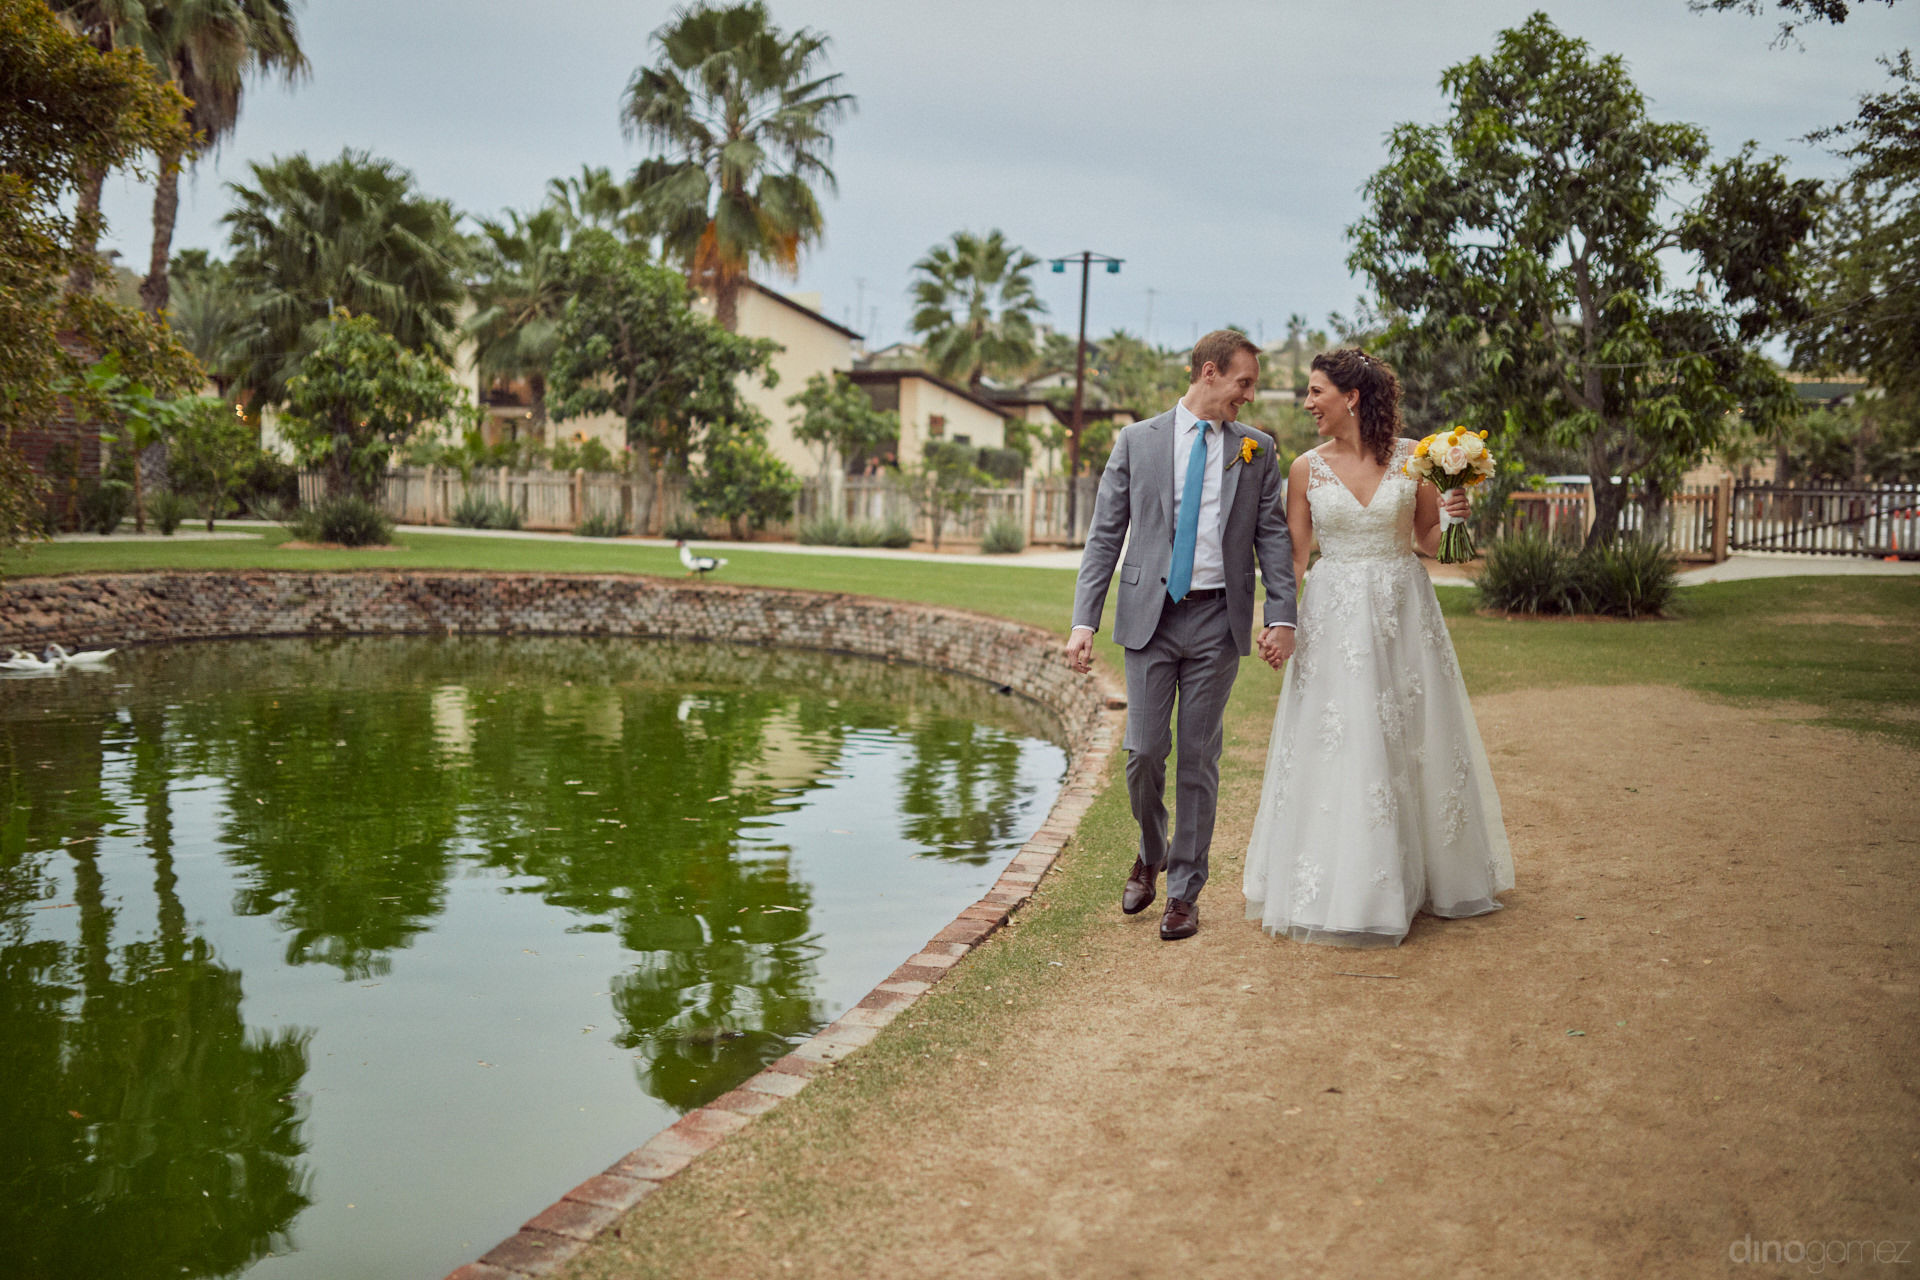 Wedding Venues Cabo San Lucas Like Flora Farms - Hilary & Bryan Flora Wedding